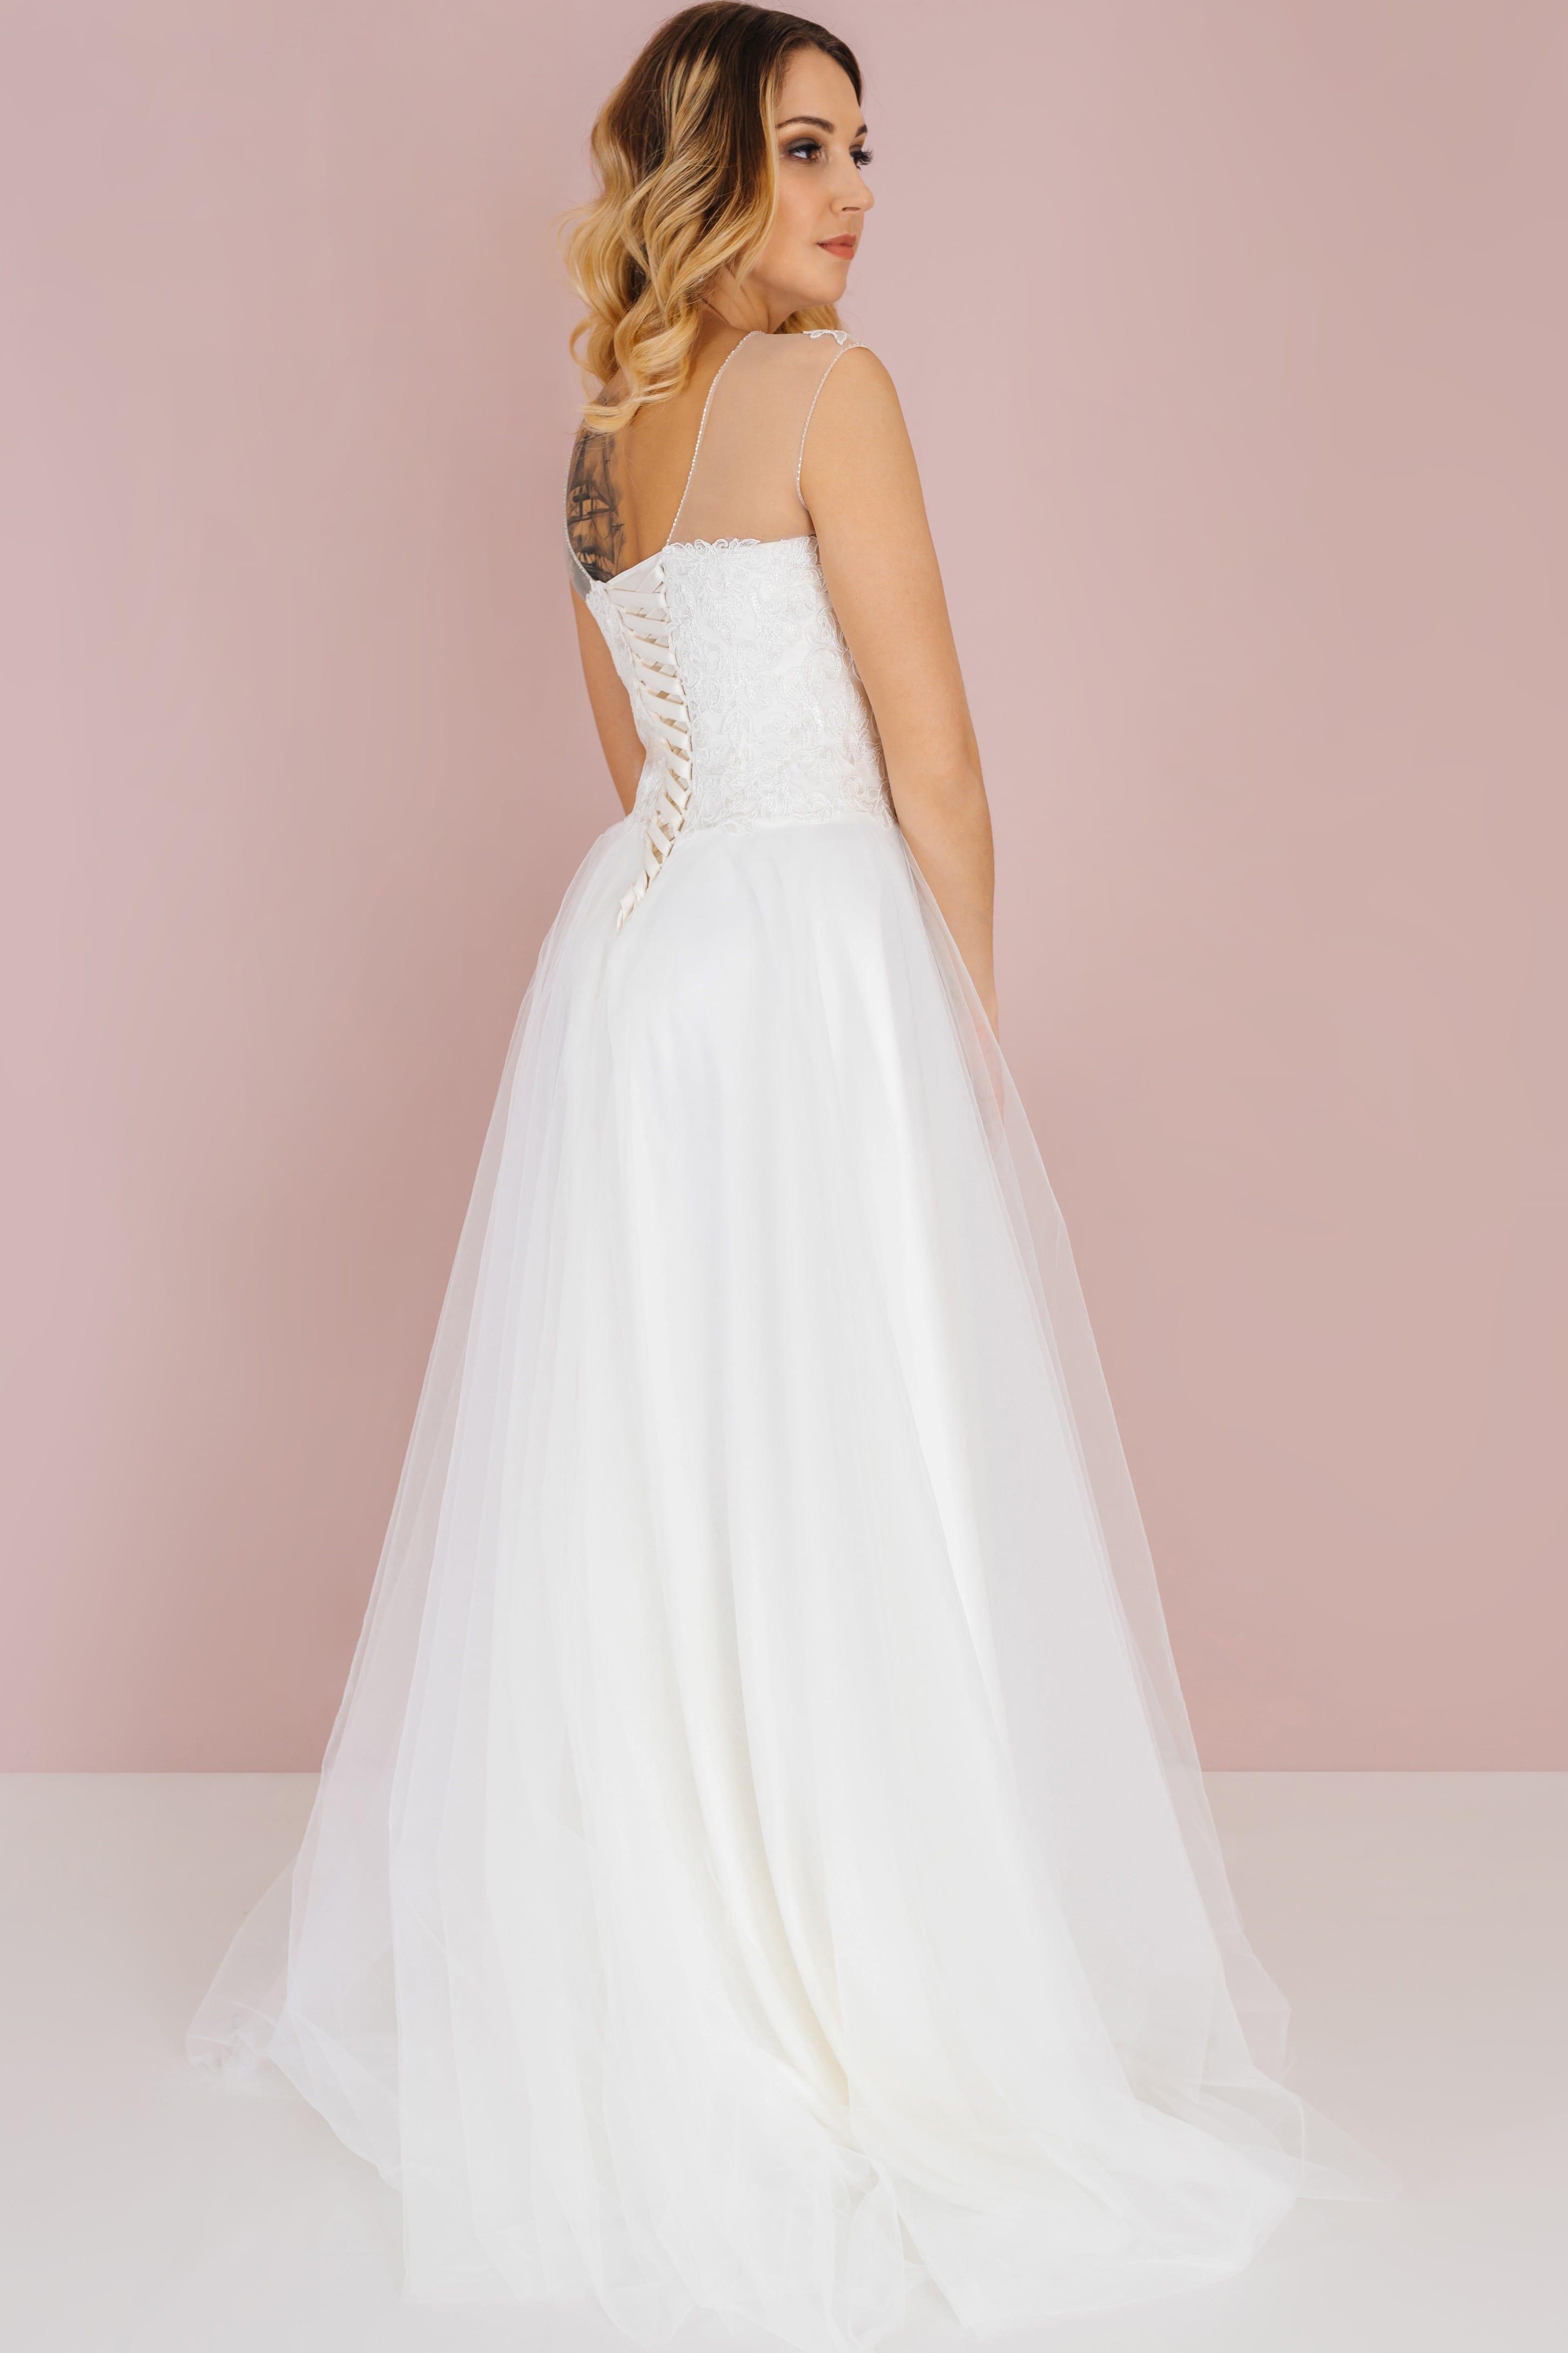 Свадебное платье MIA, коллекция LOFT, бренд RARE BRIDAL, фото 2